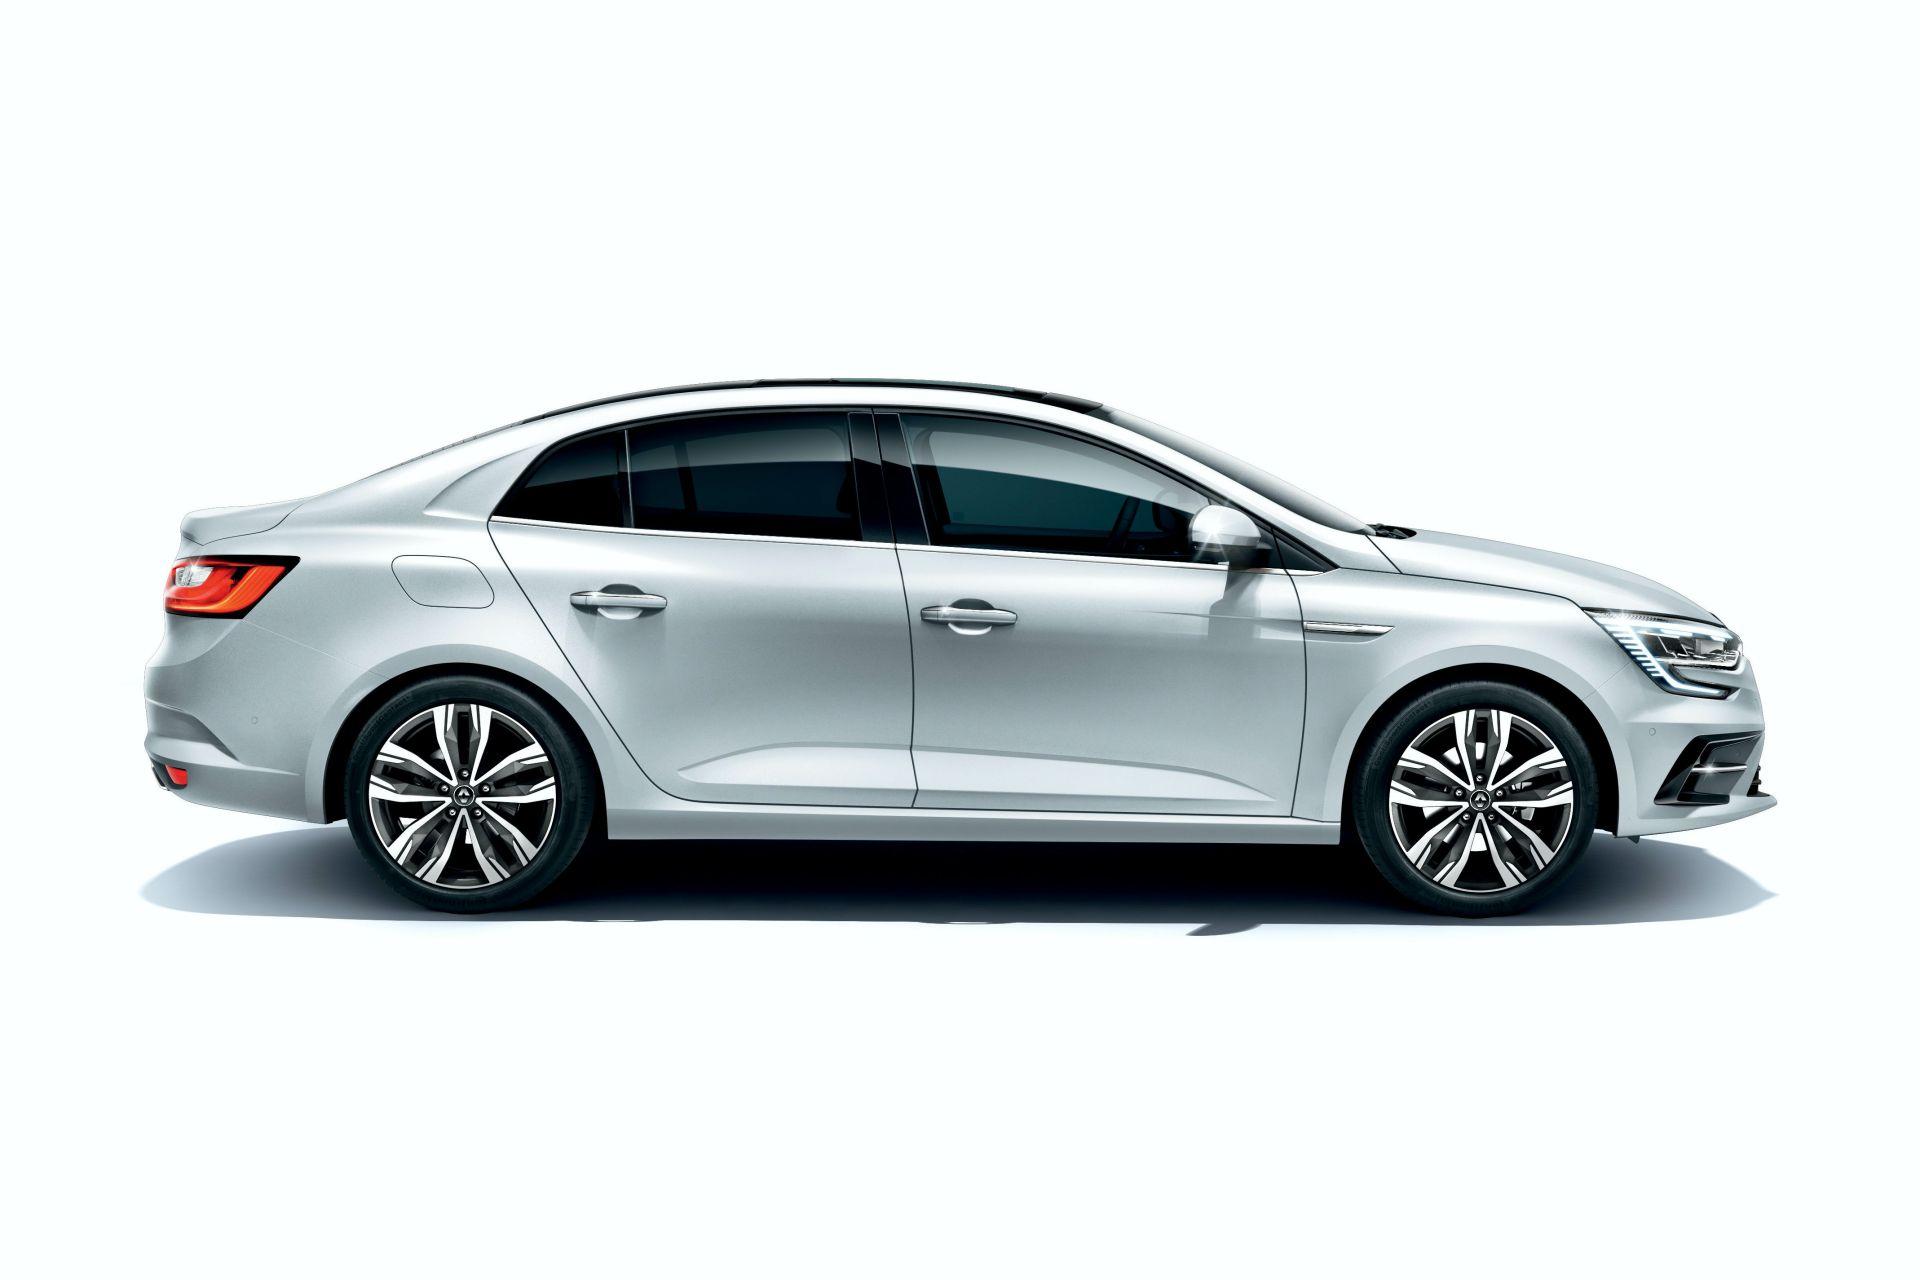 2021-Renault-Megane-Sedan-facelift-9